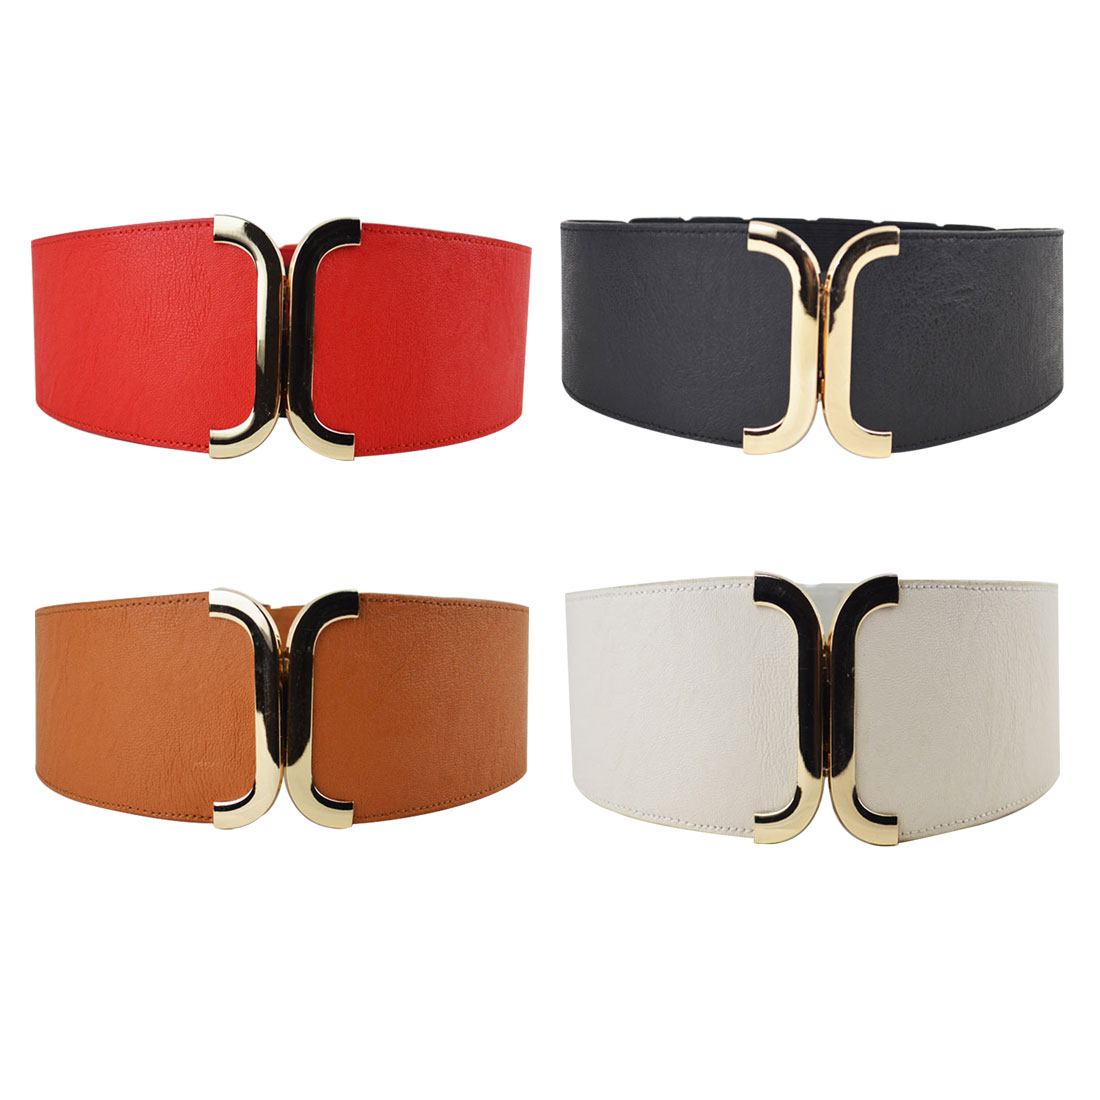 Hot Women Brief   Belt   Female Wide   Belt   Decoration Elastic Fashion Cummerbund Strap All-Match Lady'S Waist   Belts   For Women